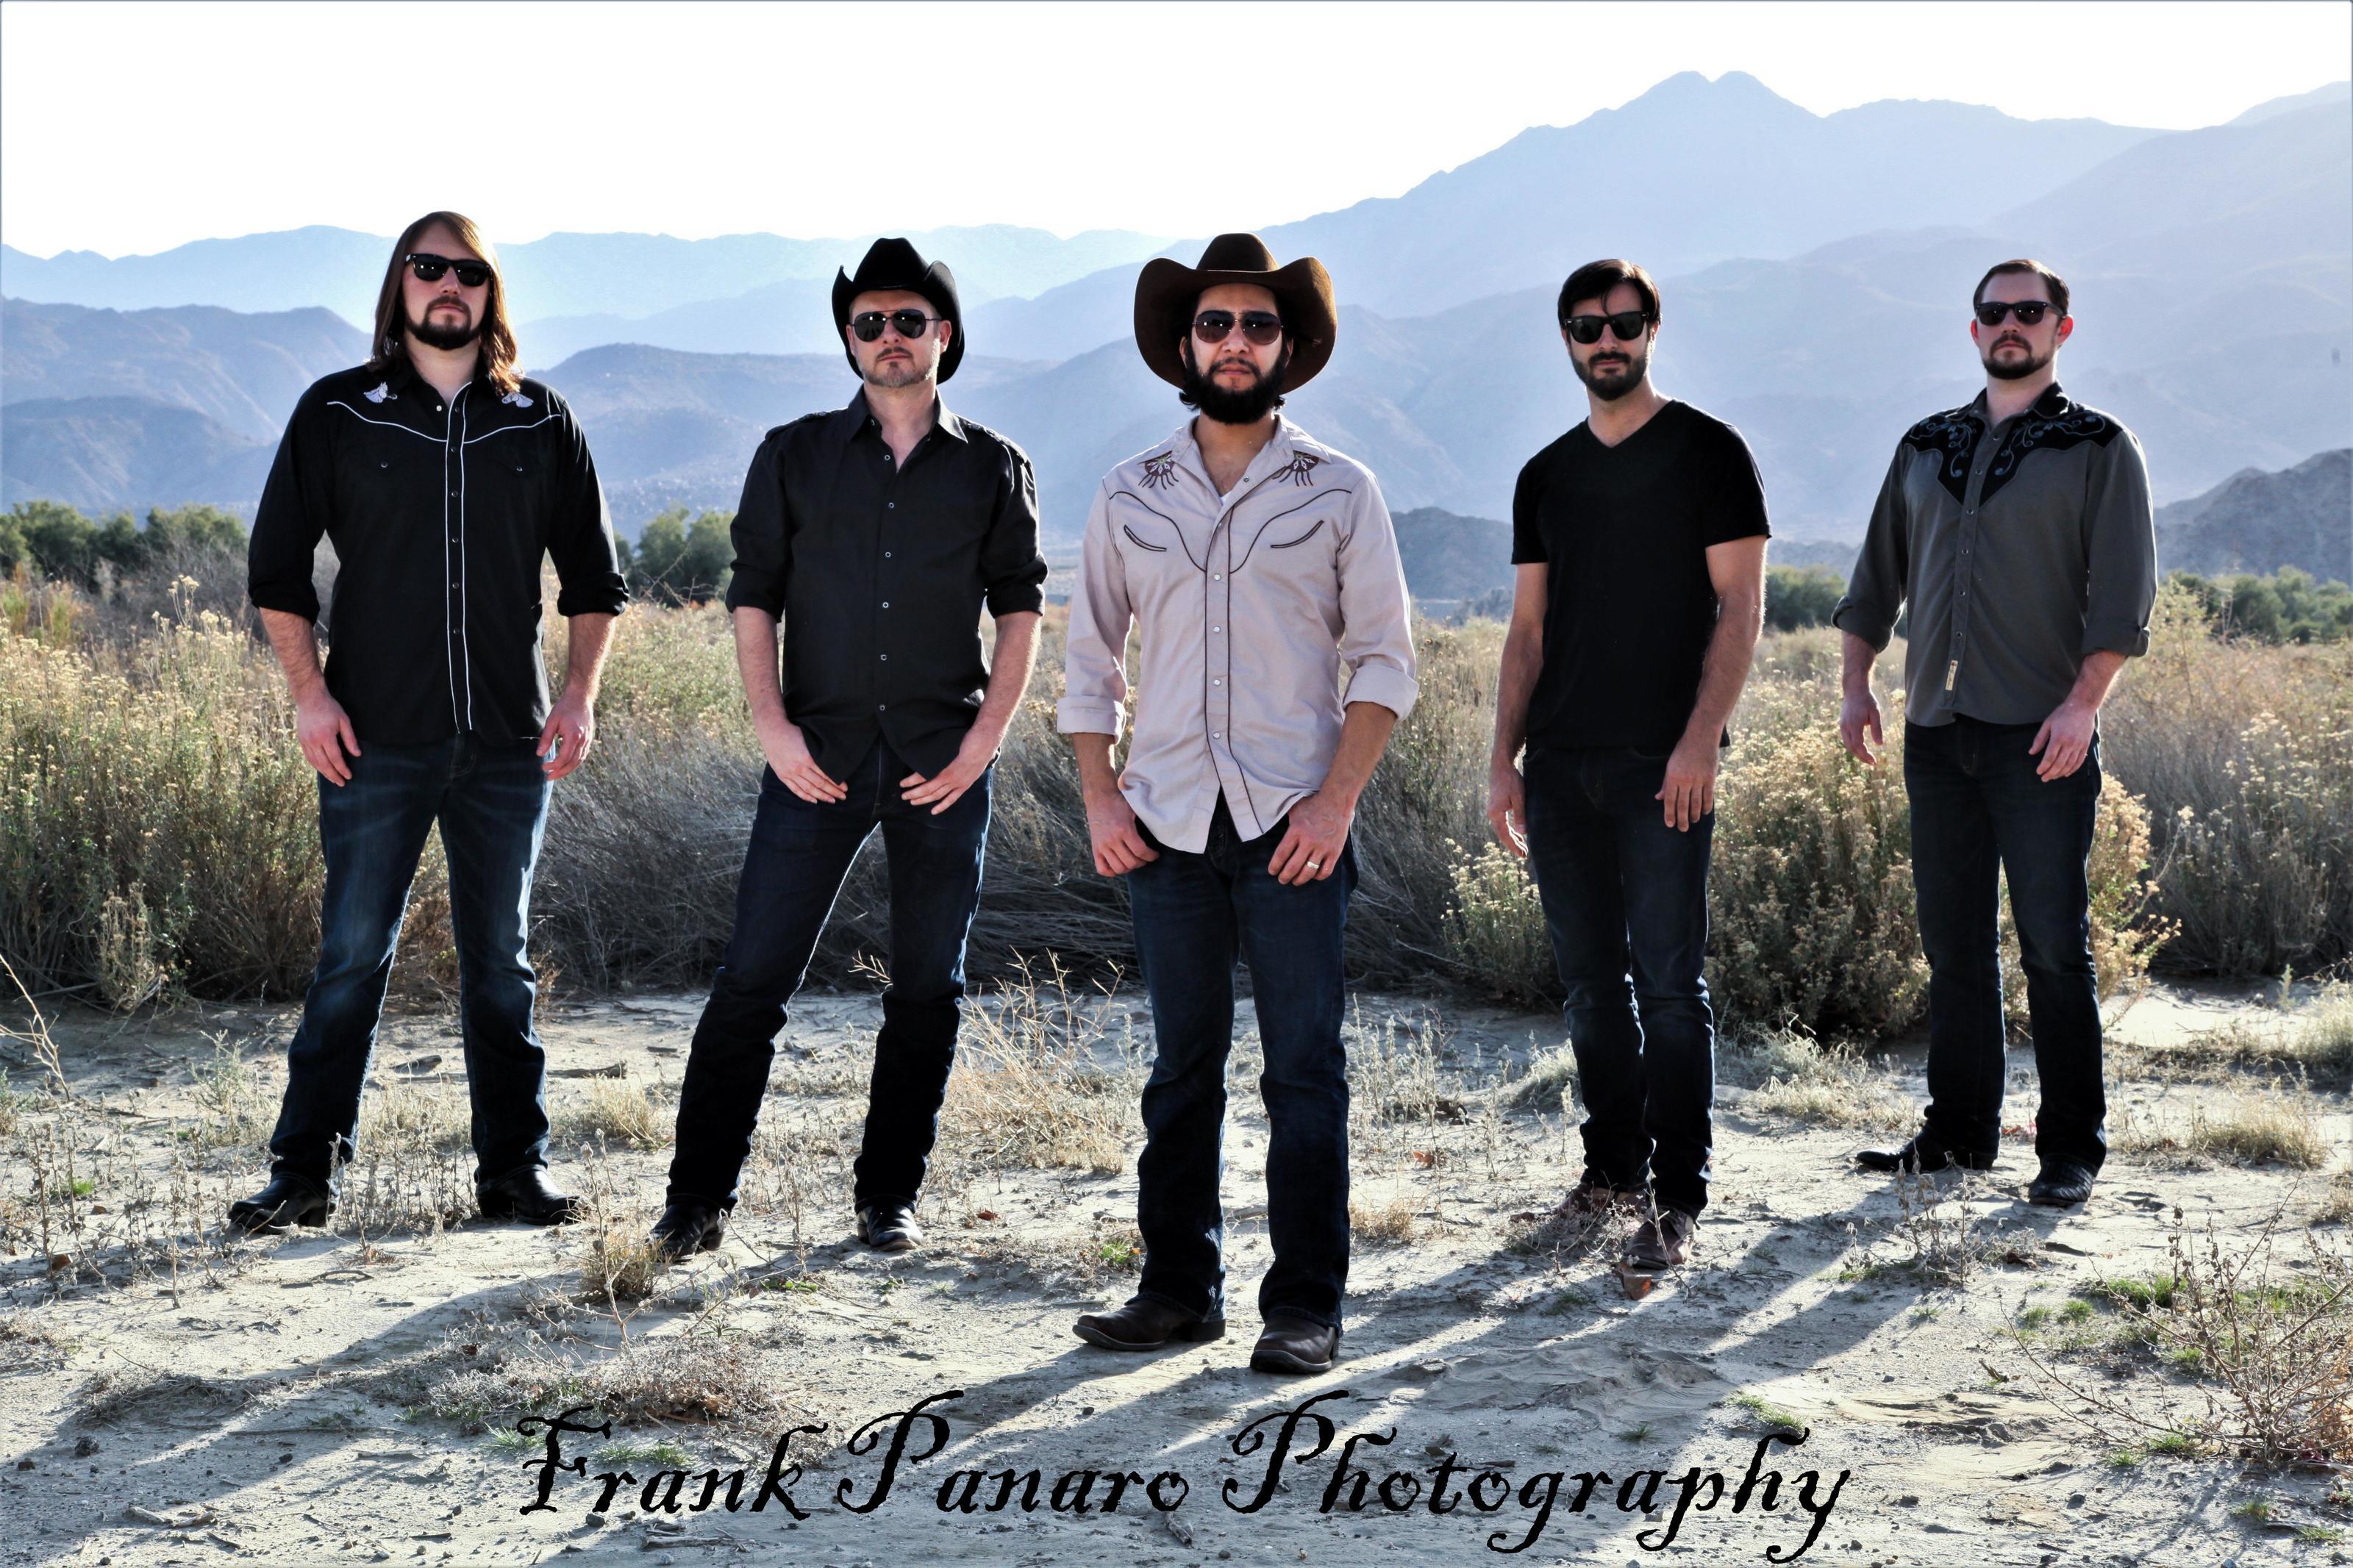 Photo by: Frank Panaro Photography